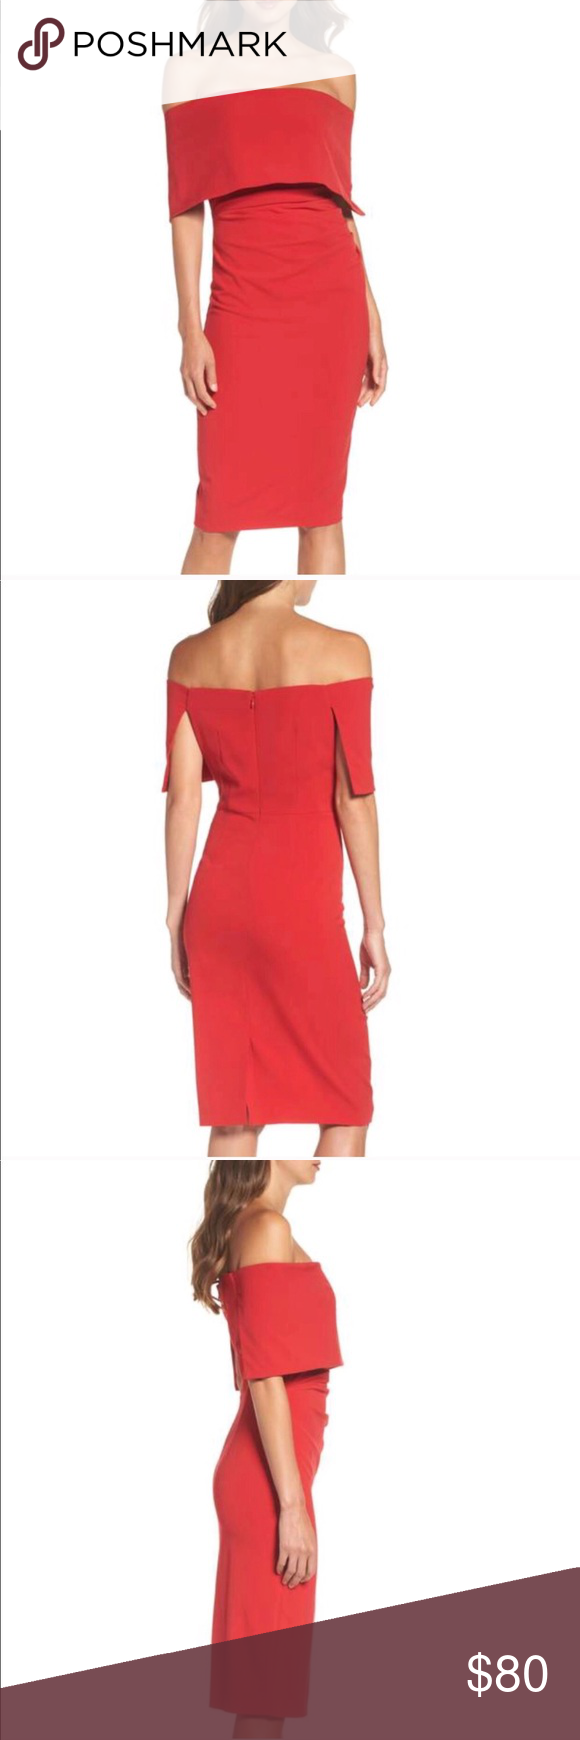 Popover Midi Red Dress Red Midi Dress Dresses Clothes Design [ 1740 x 580 Pixel ]